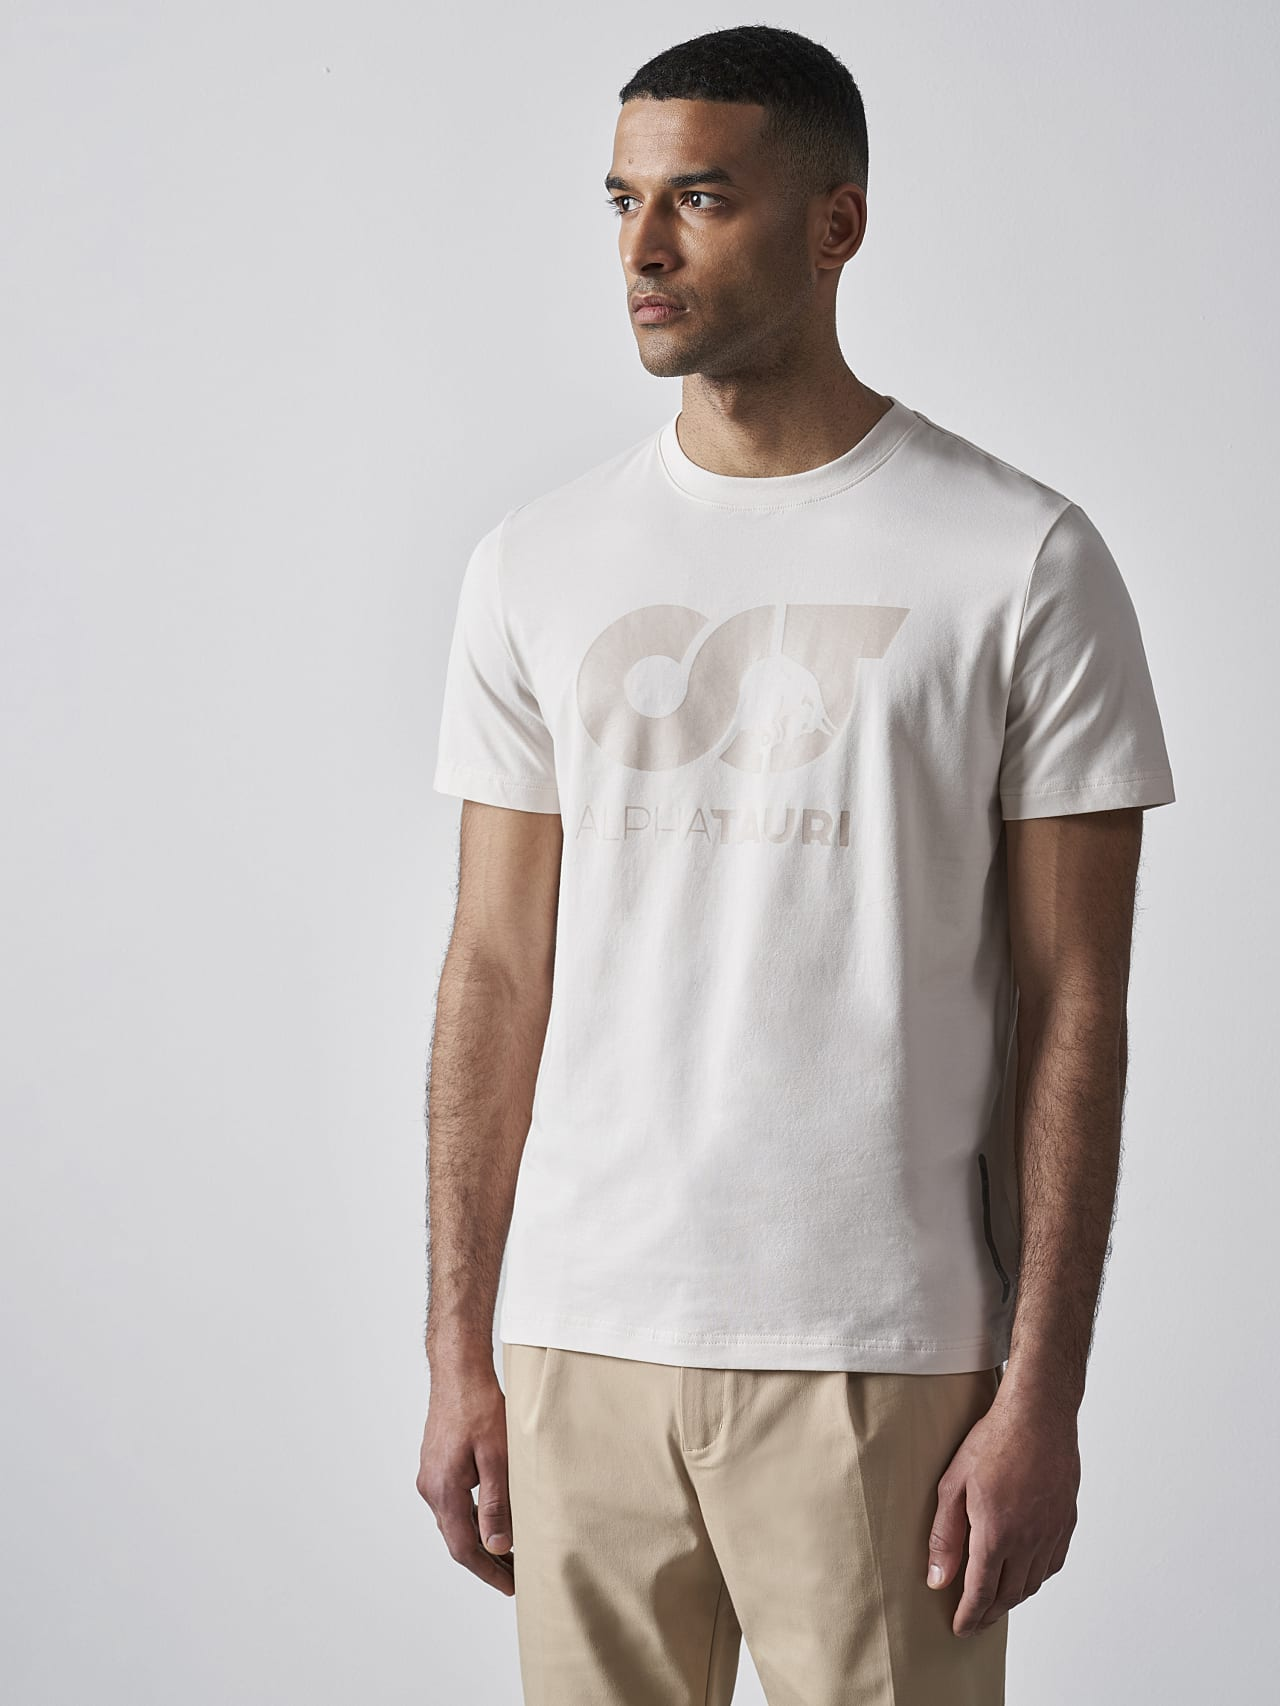 JERO V2.Y4.02 Signature Logo T-Shirt Sand Model shot Alpha Tauri